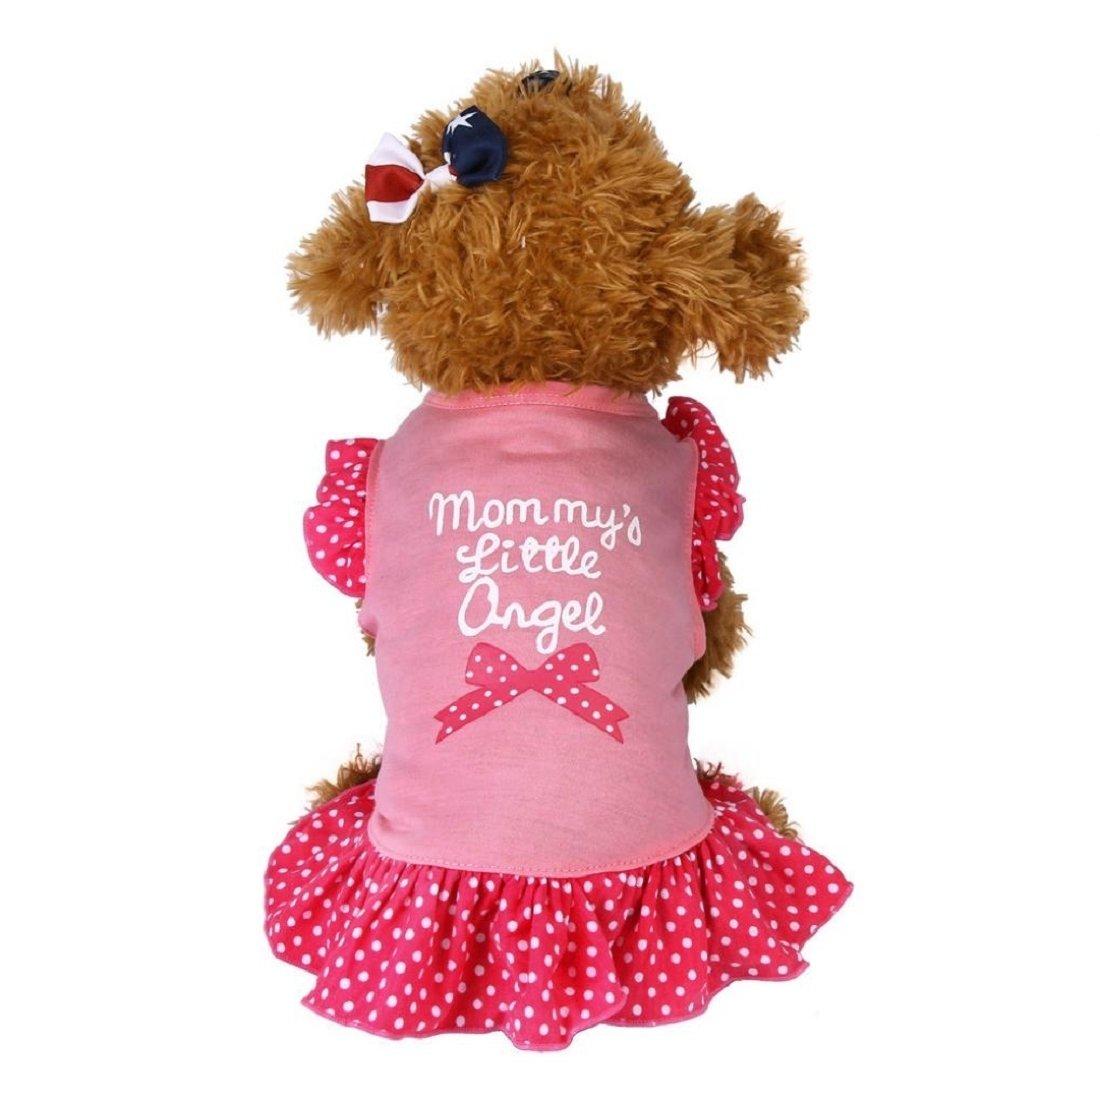 GONKOMA Pet Dress, Cute Puppy Small Dog Cat Princess Dress Apparel Outfit Clothes XWJ520